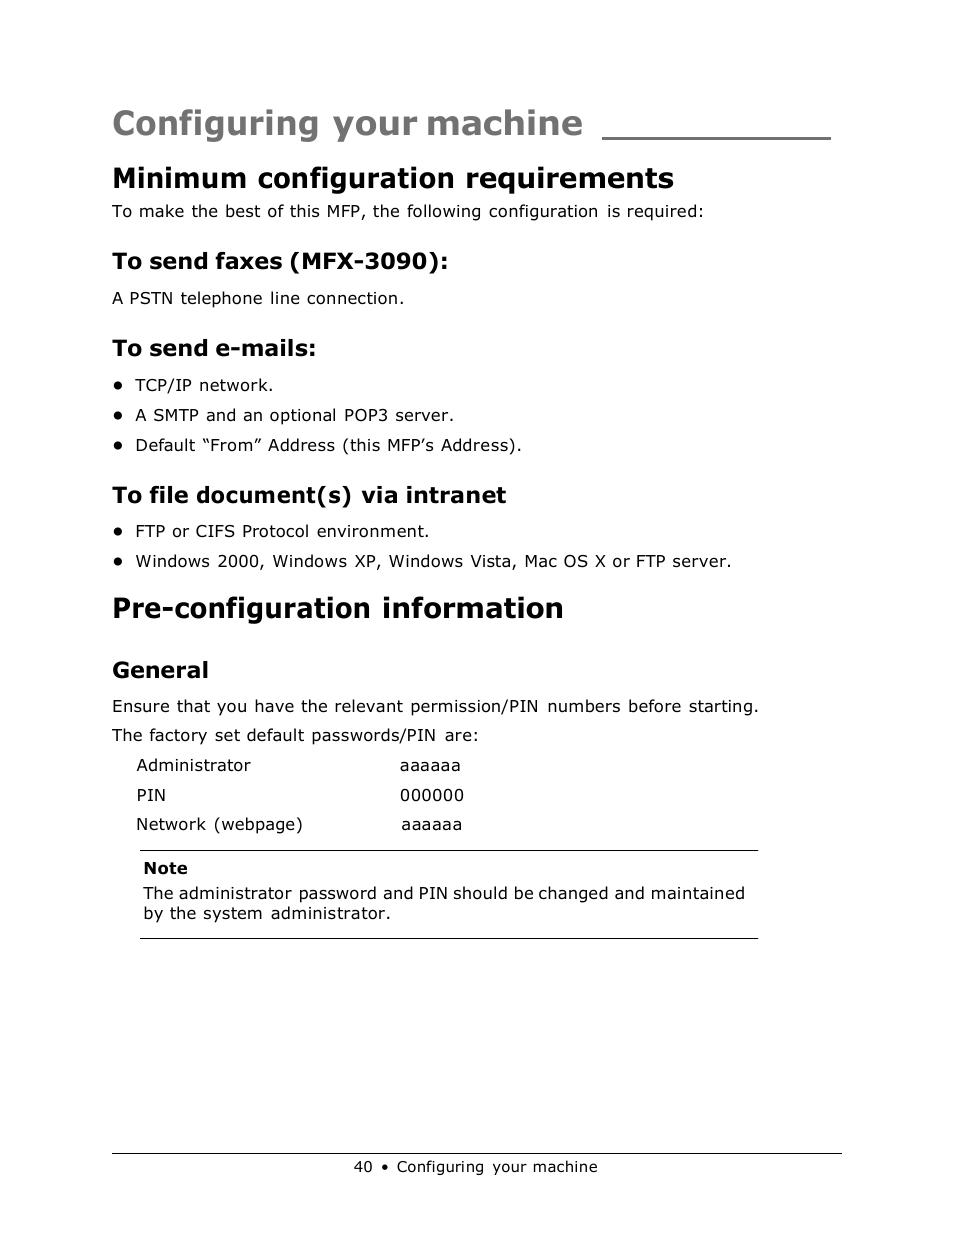 windows 2000 server default administrator password